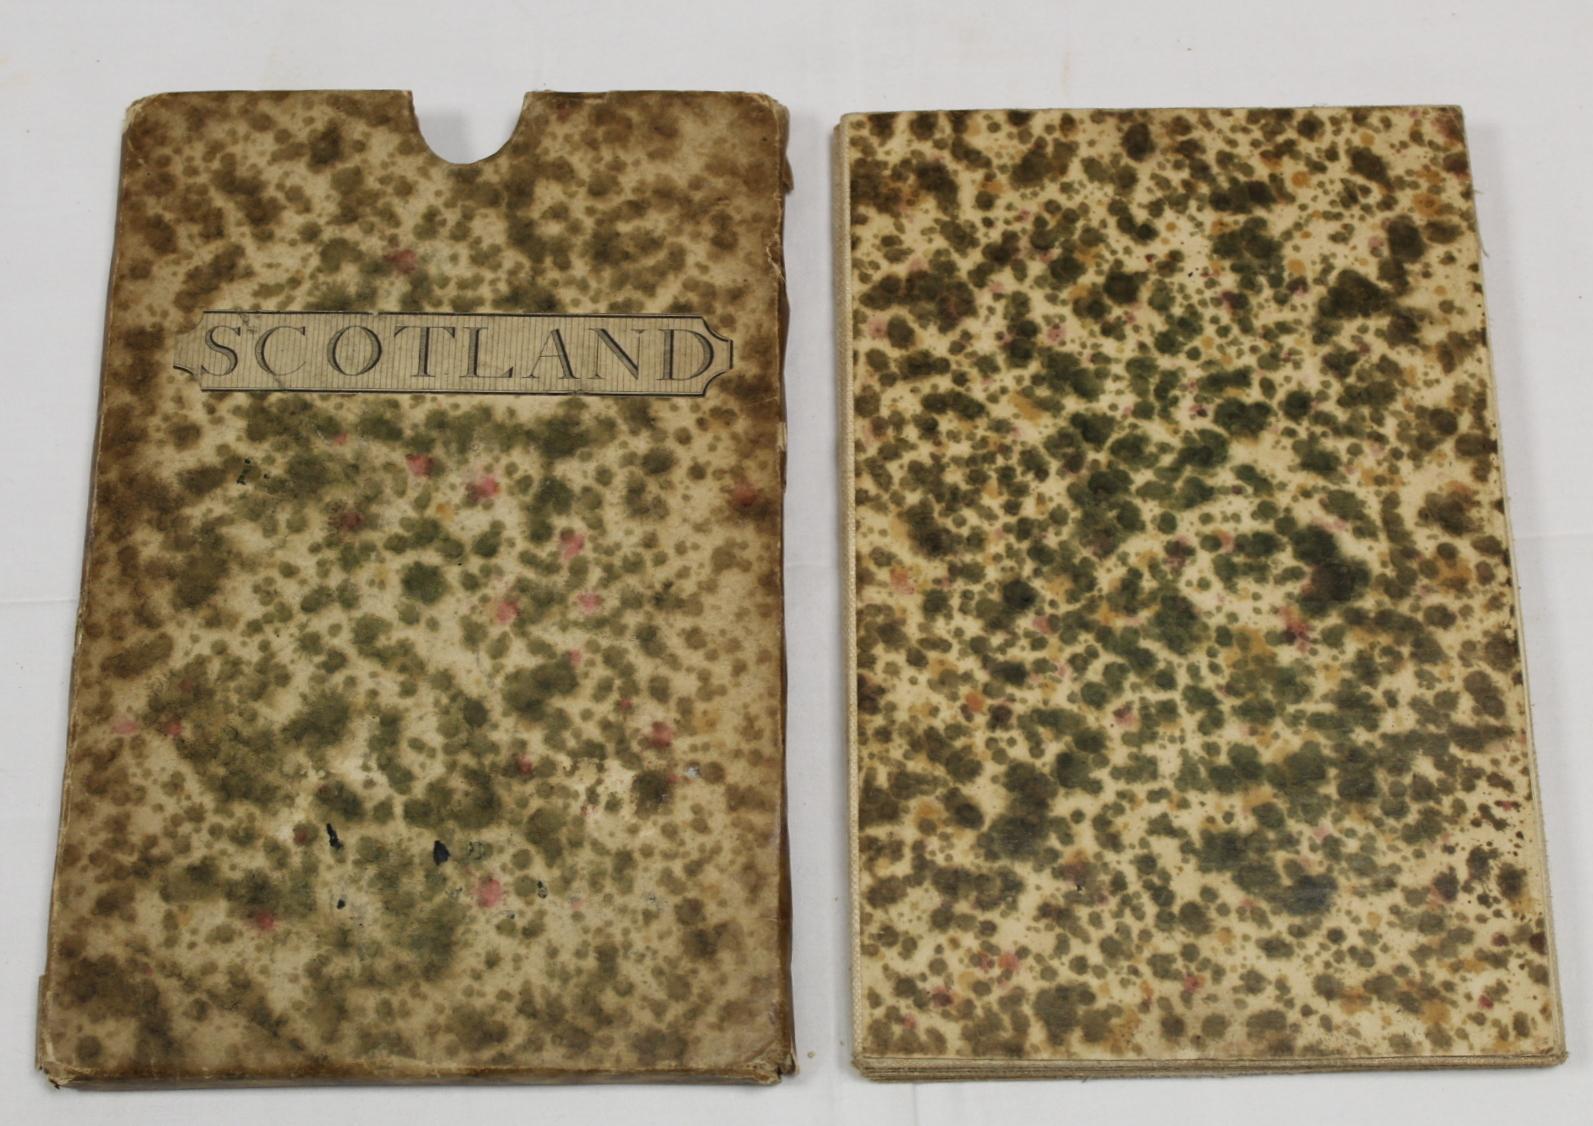 KIRKWOOD J. & SONS.Map of Scotland. Hand col. eng. fldg. linen map in well worn orig. slip case. - Image 32 of 36